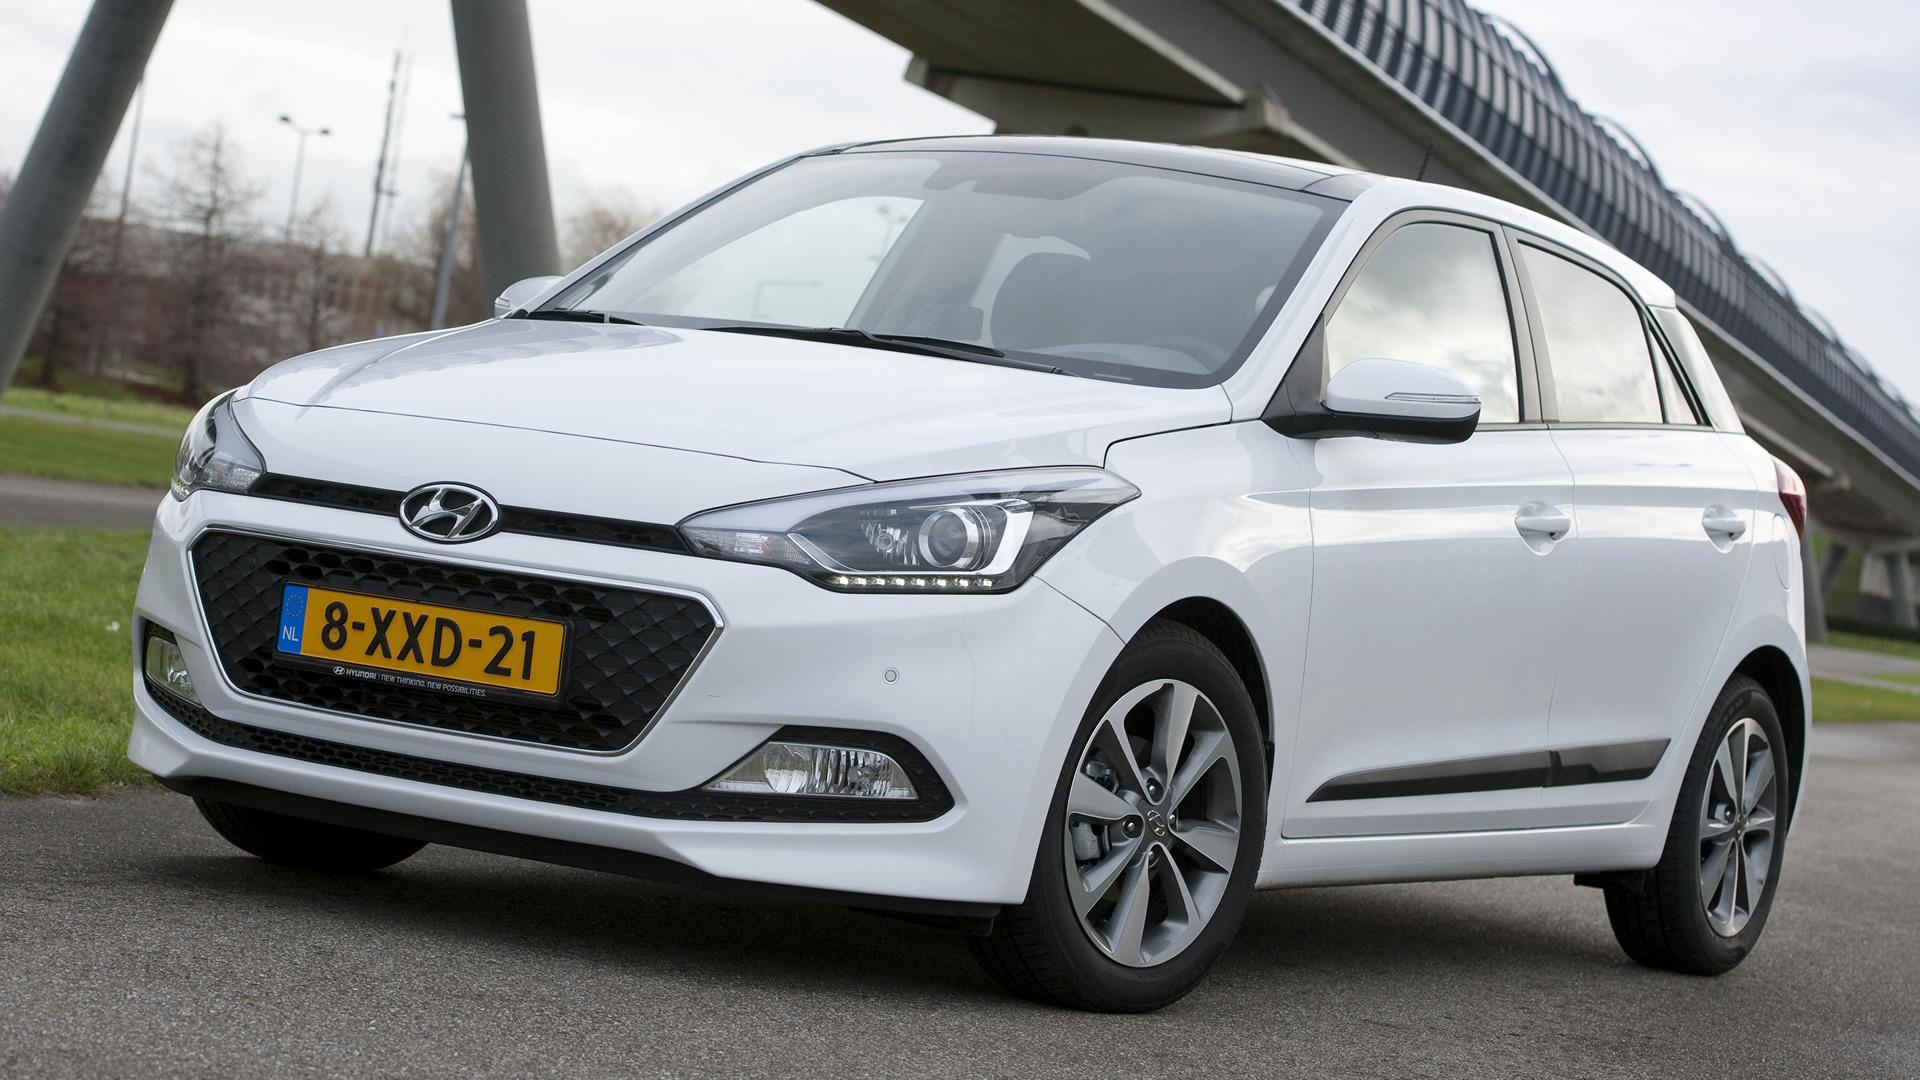 Hyundai I20 Blue 2014 Wallpapers And Hd Images Car Pixel